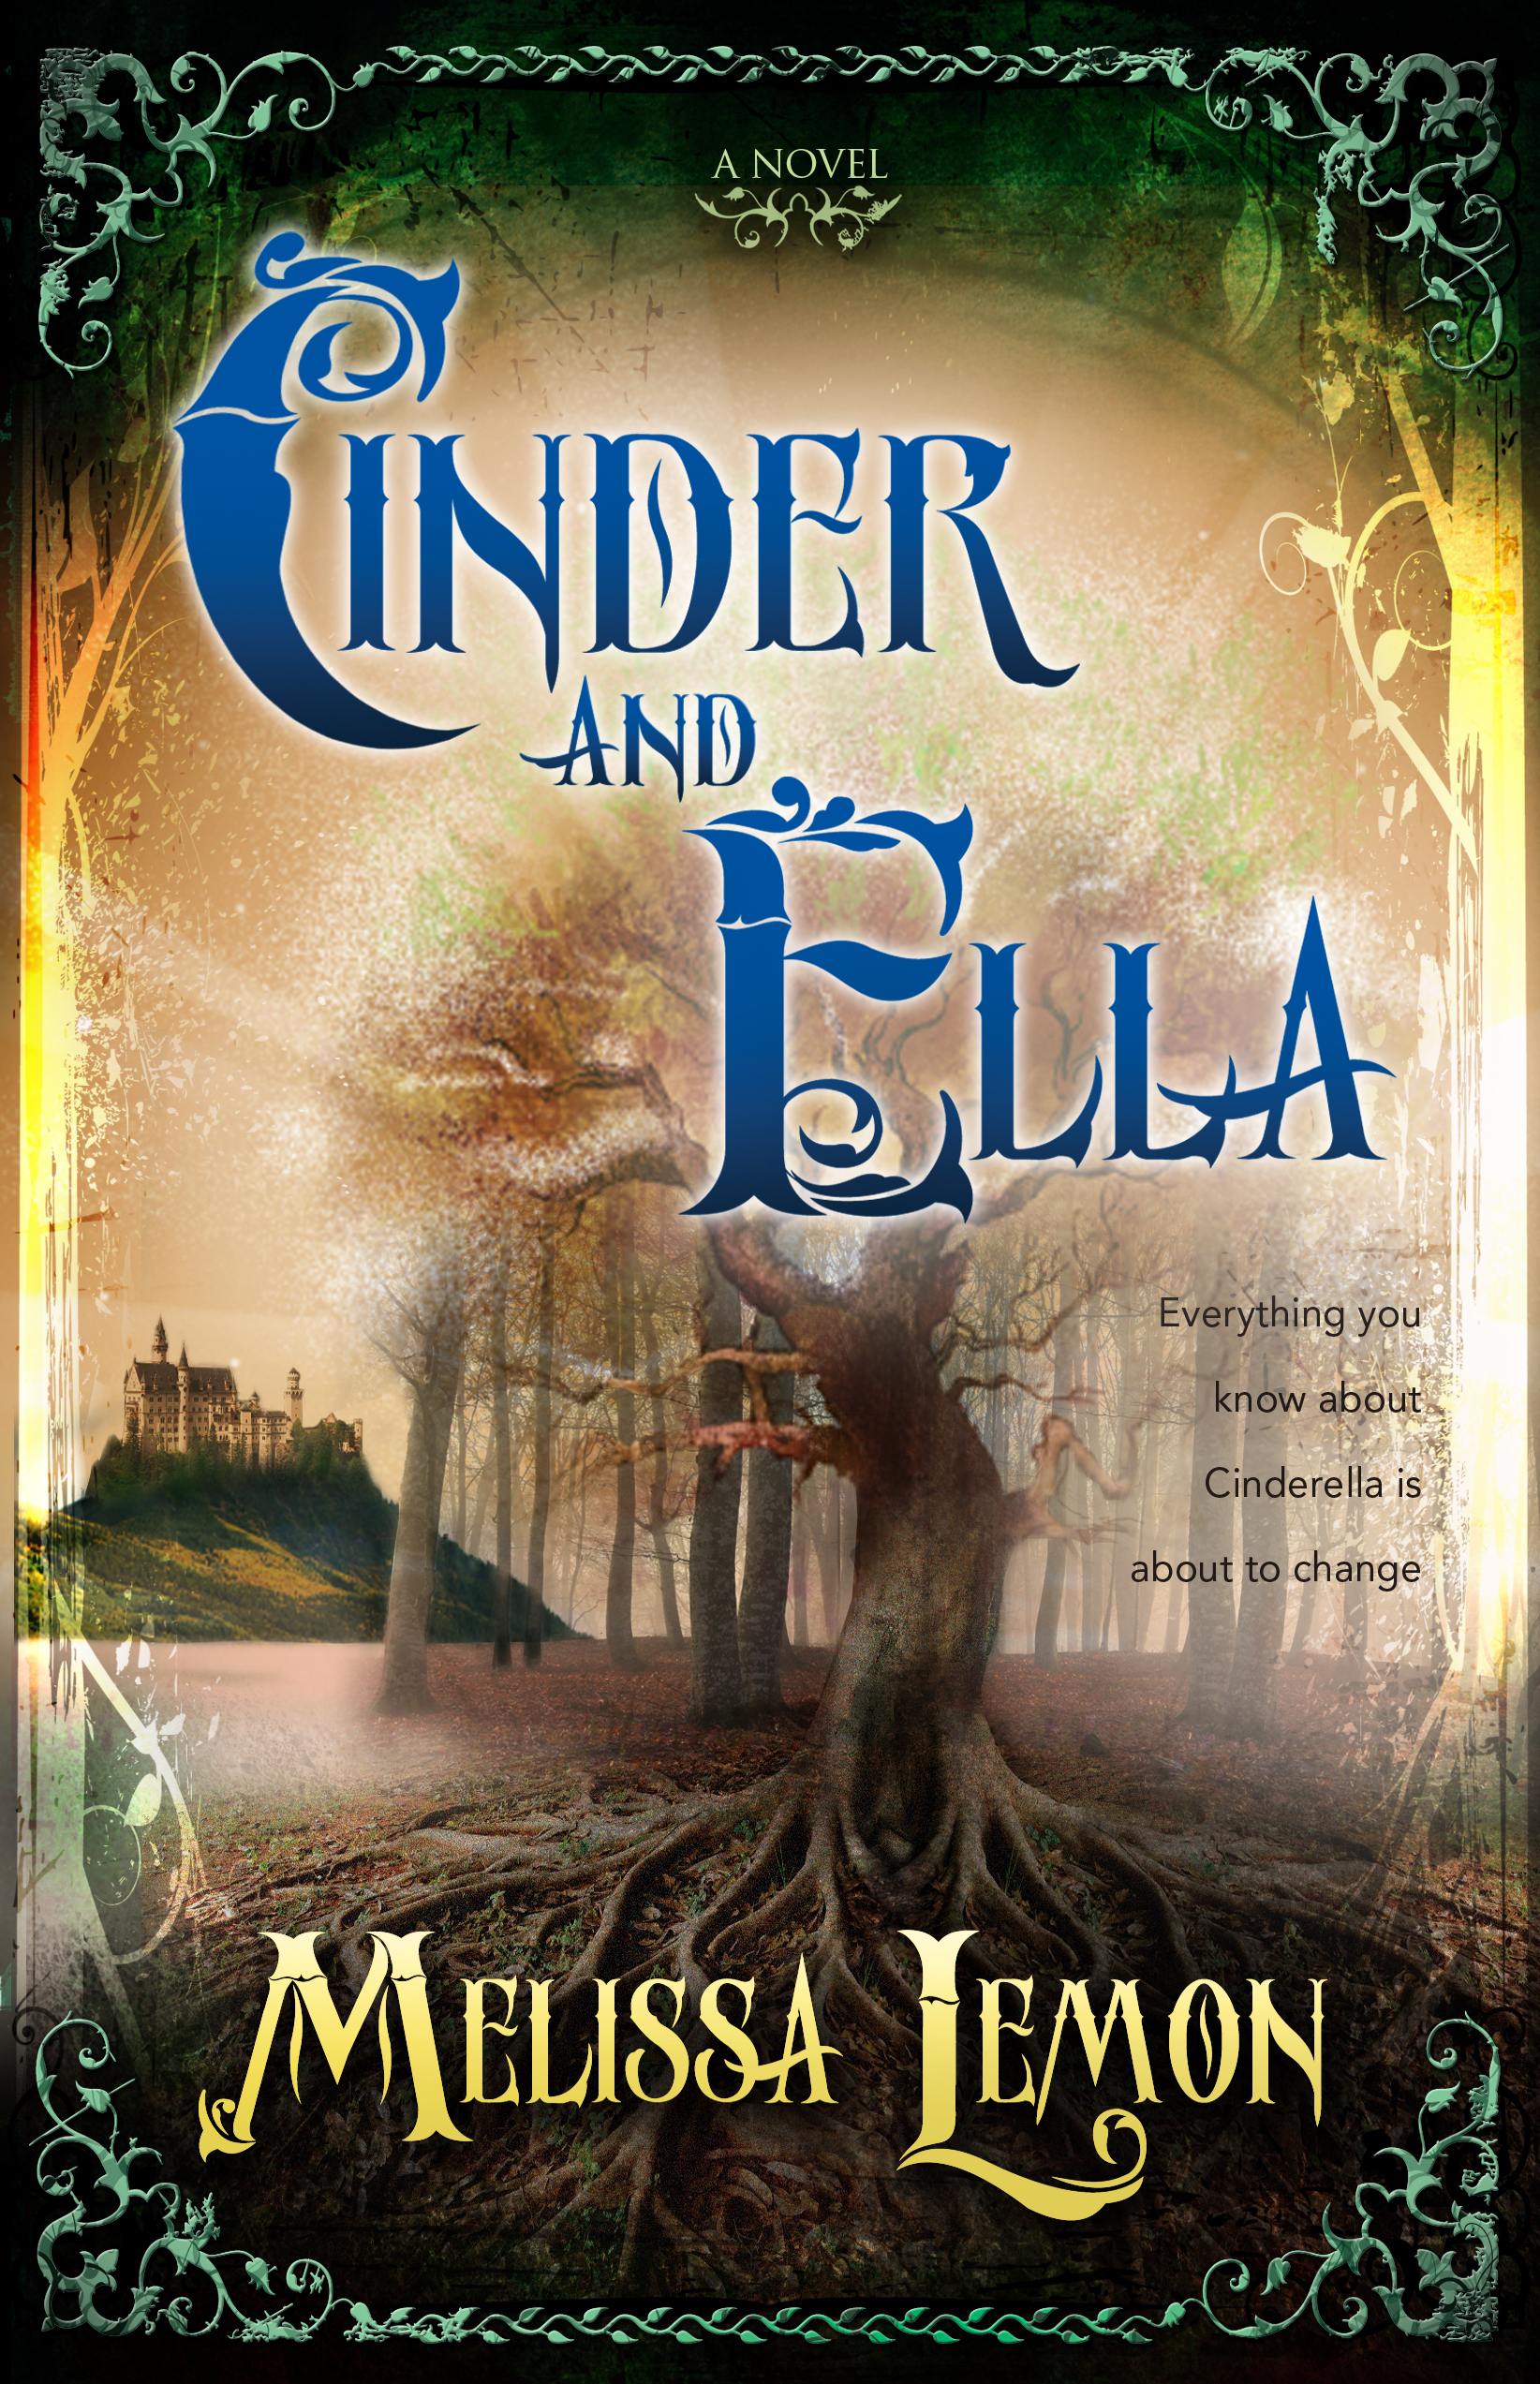 Melissa Lemon - Cinder and Ella | Books in 2019 | Books, Horror